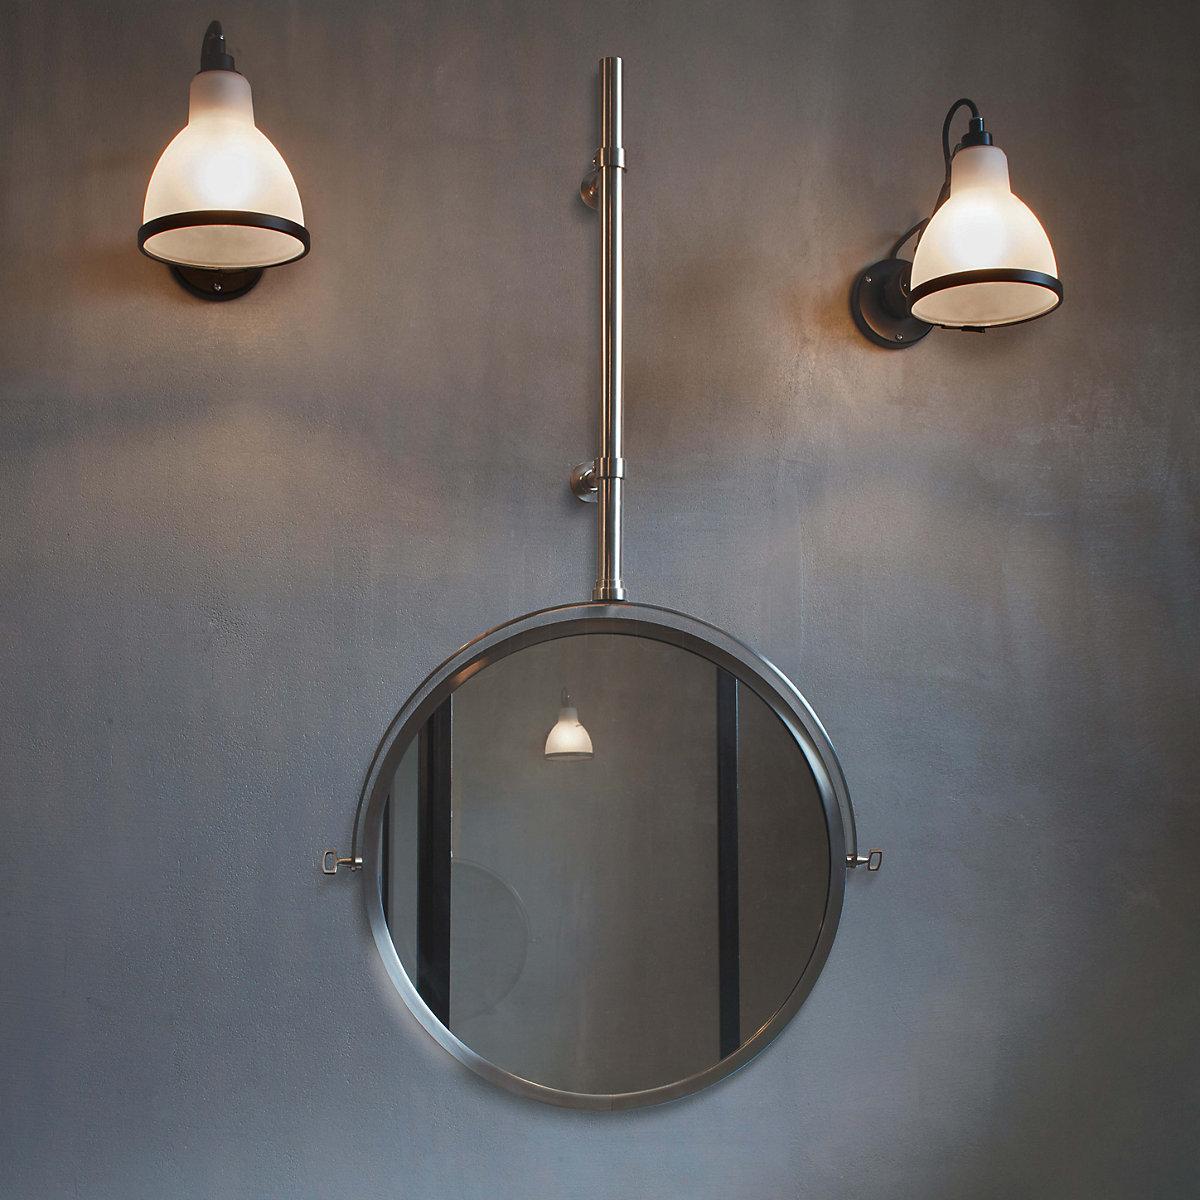 DCW Lampe Gras No 304 Bathroom Wandleuchte